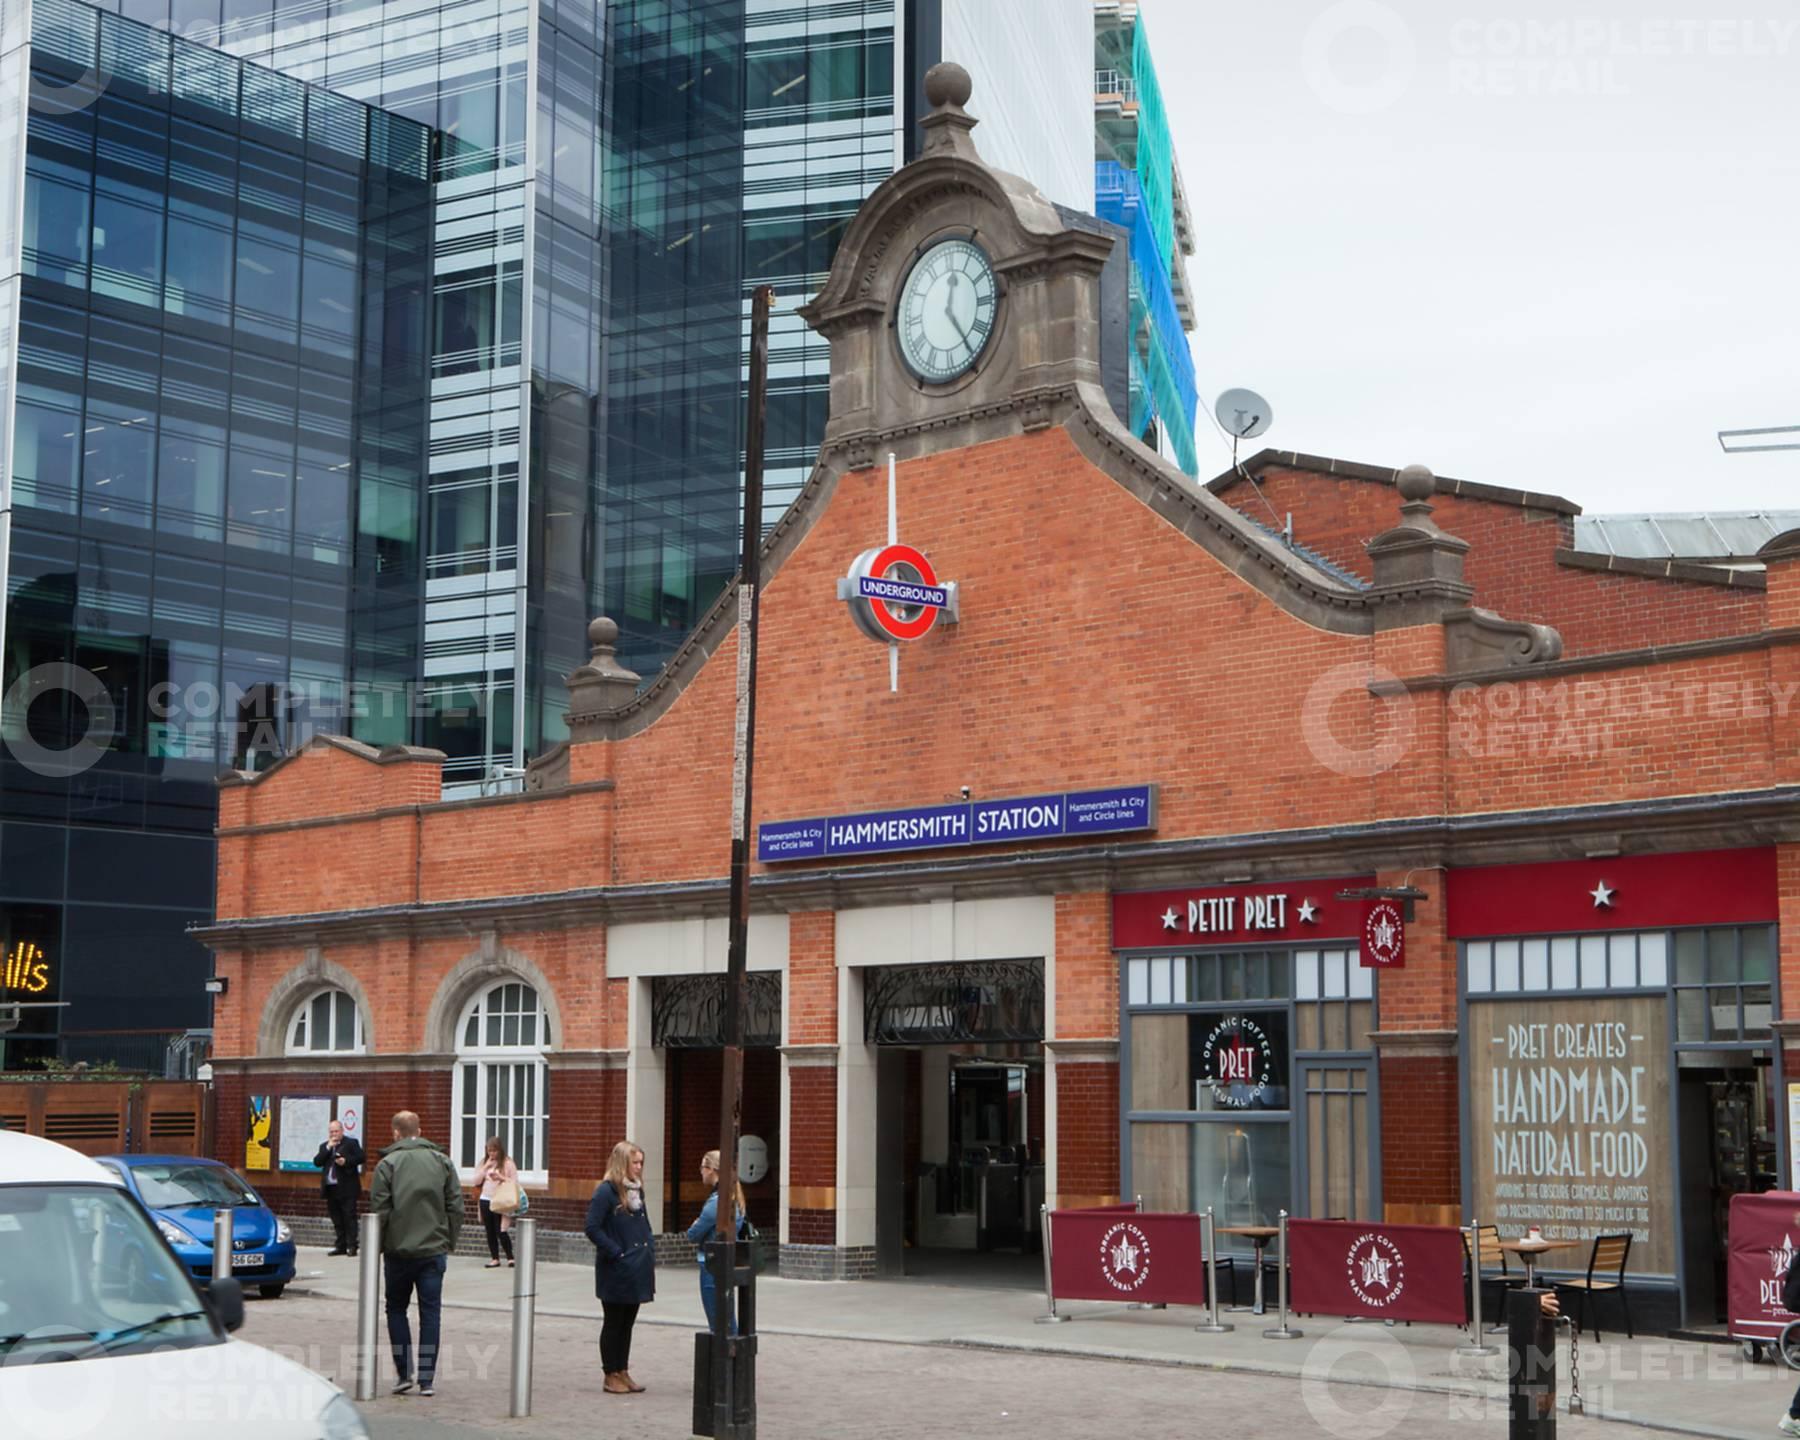 Hammersmith Station, Hammersmith - Completely Property